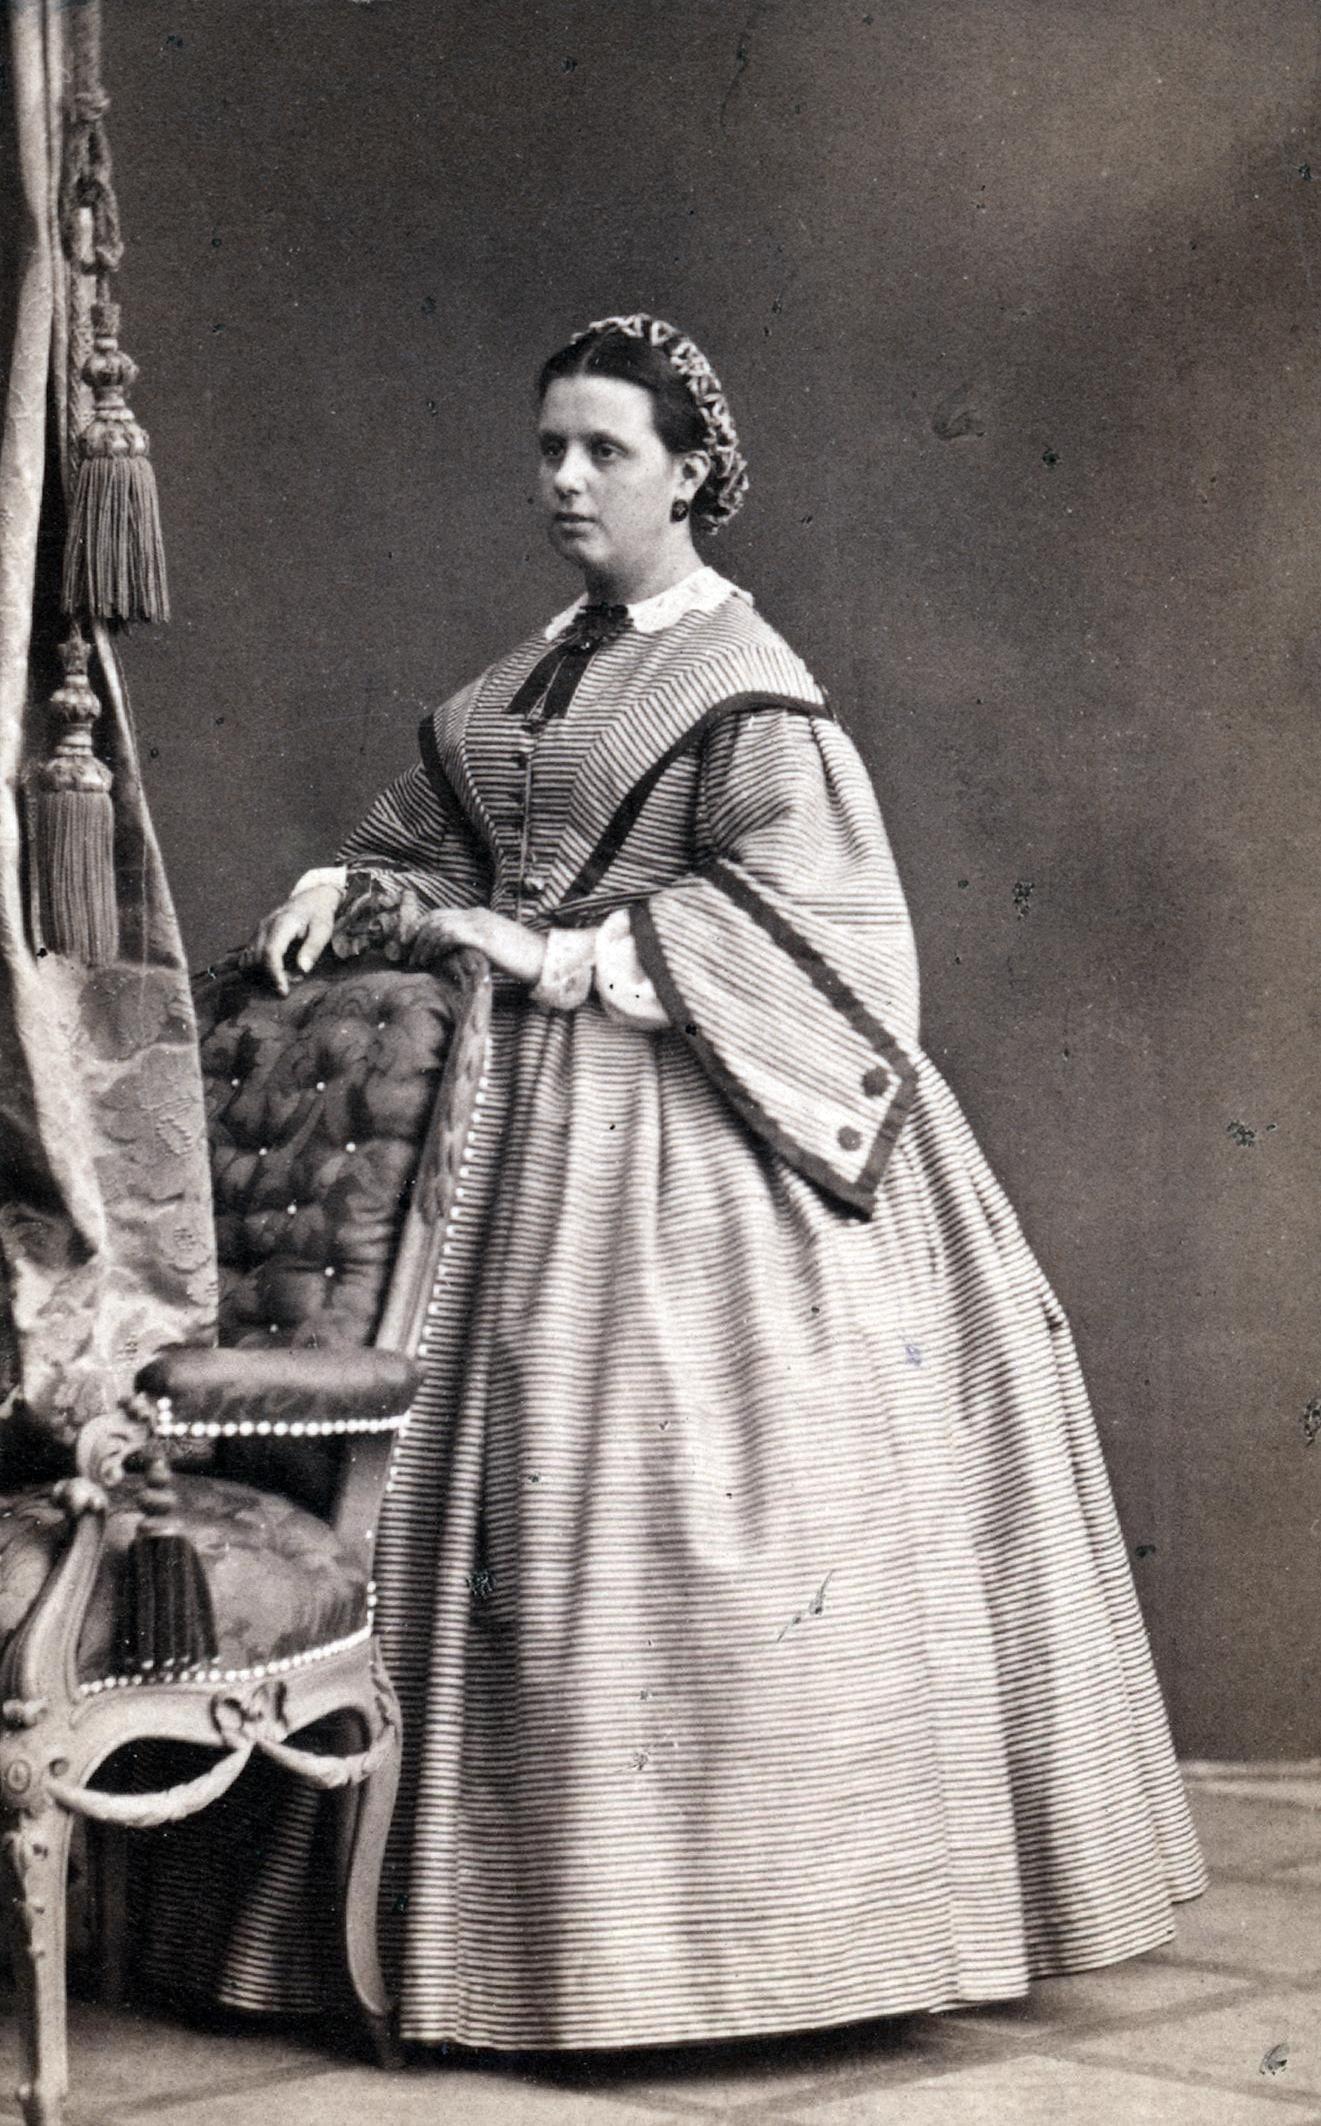 Maria Luisa of Austria, Princess of Tuscany